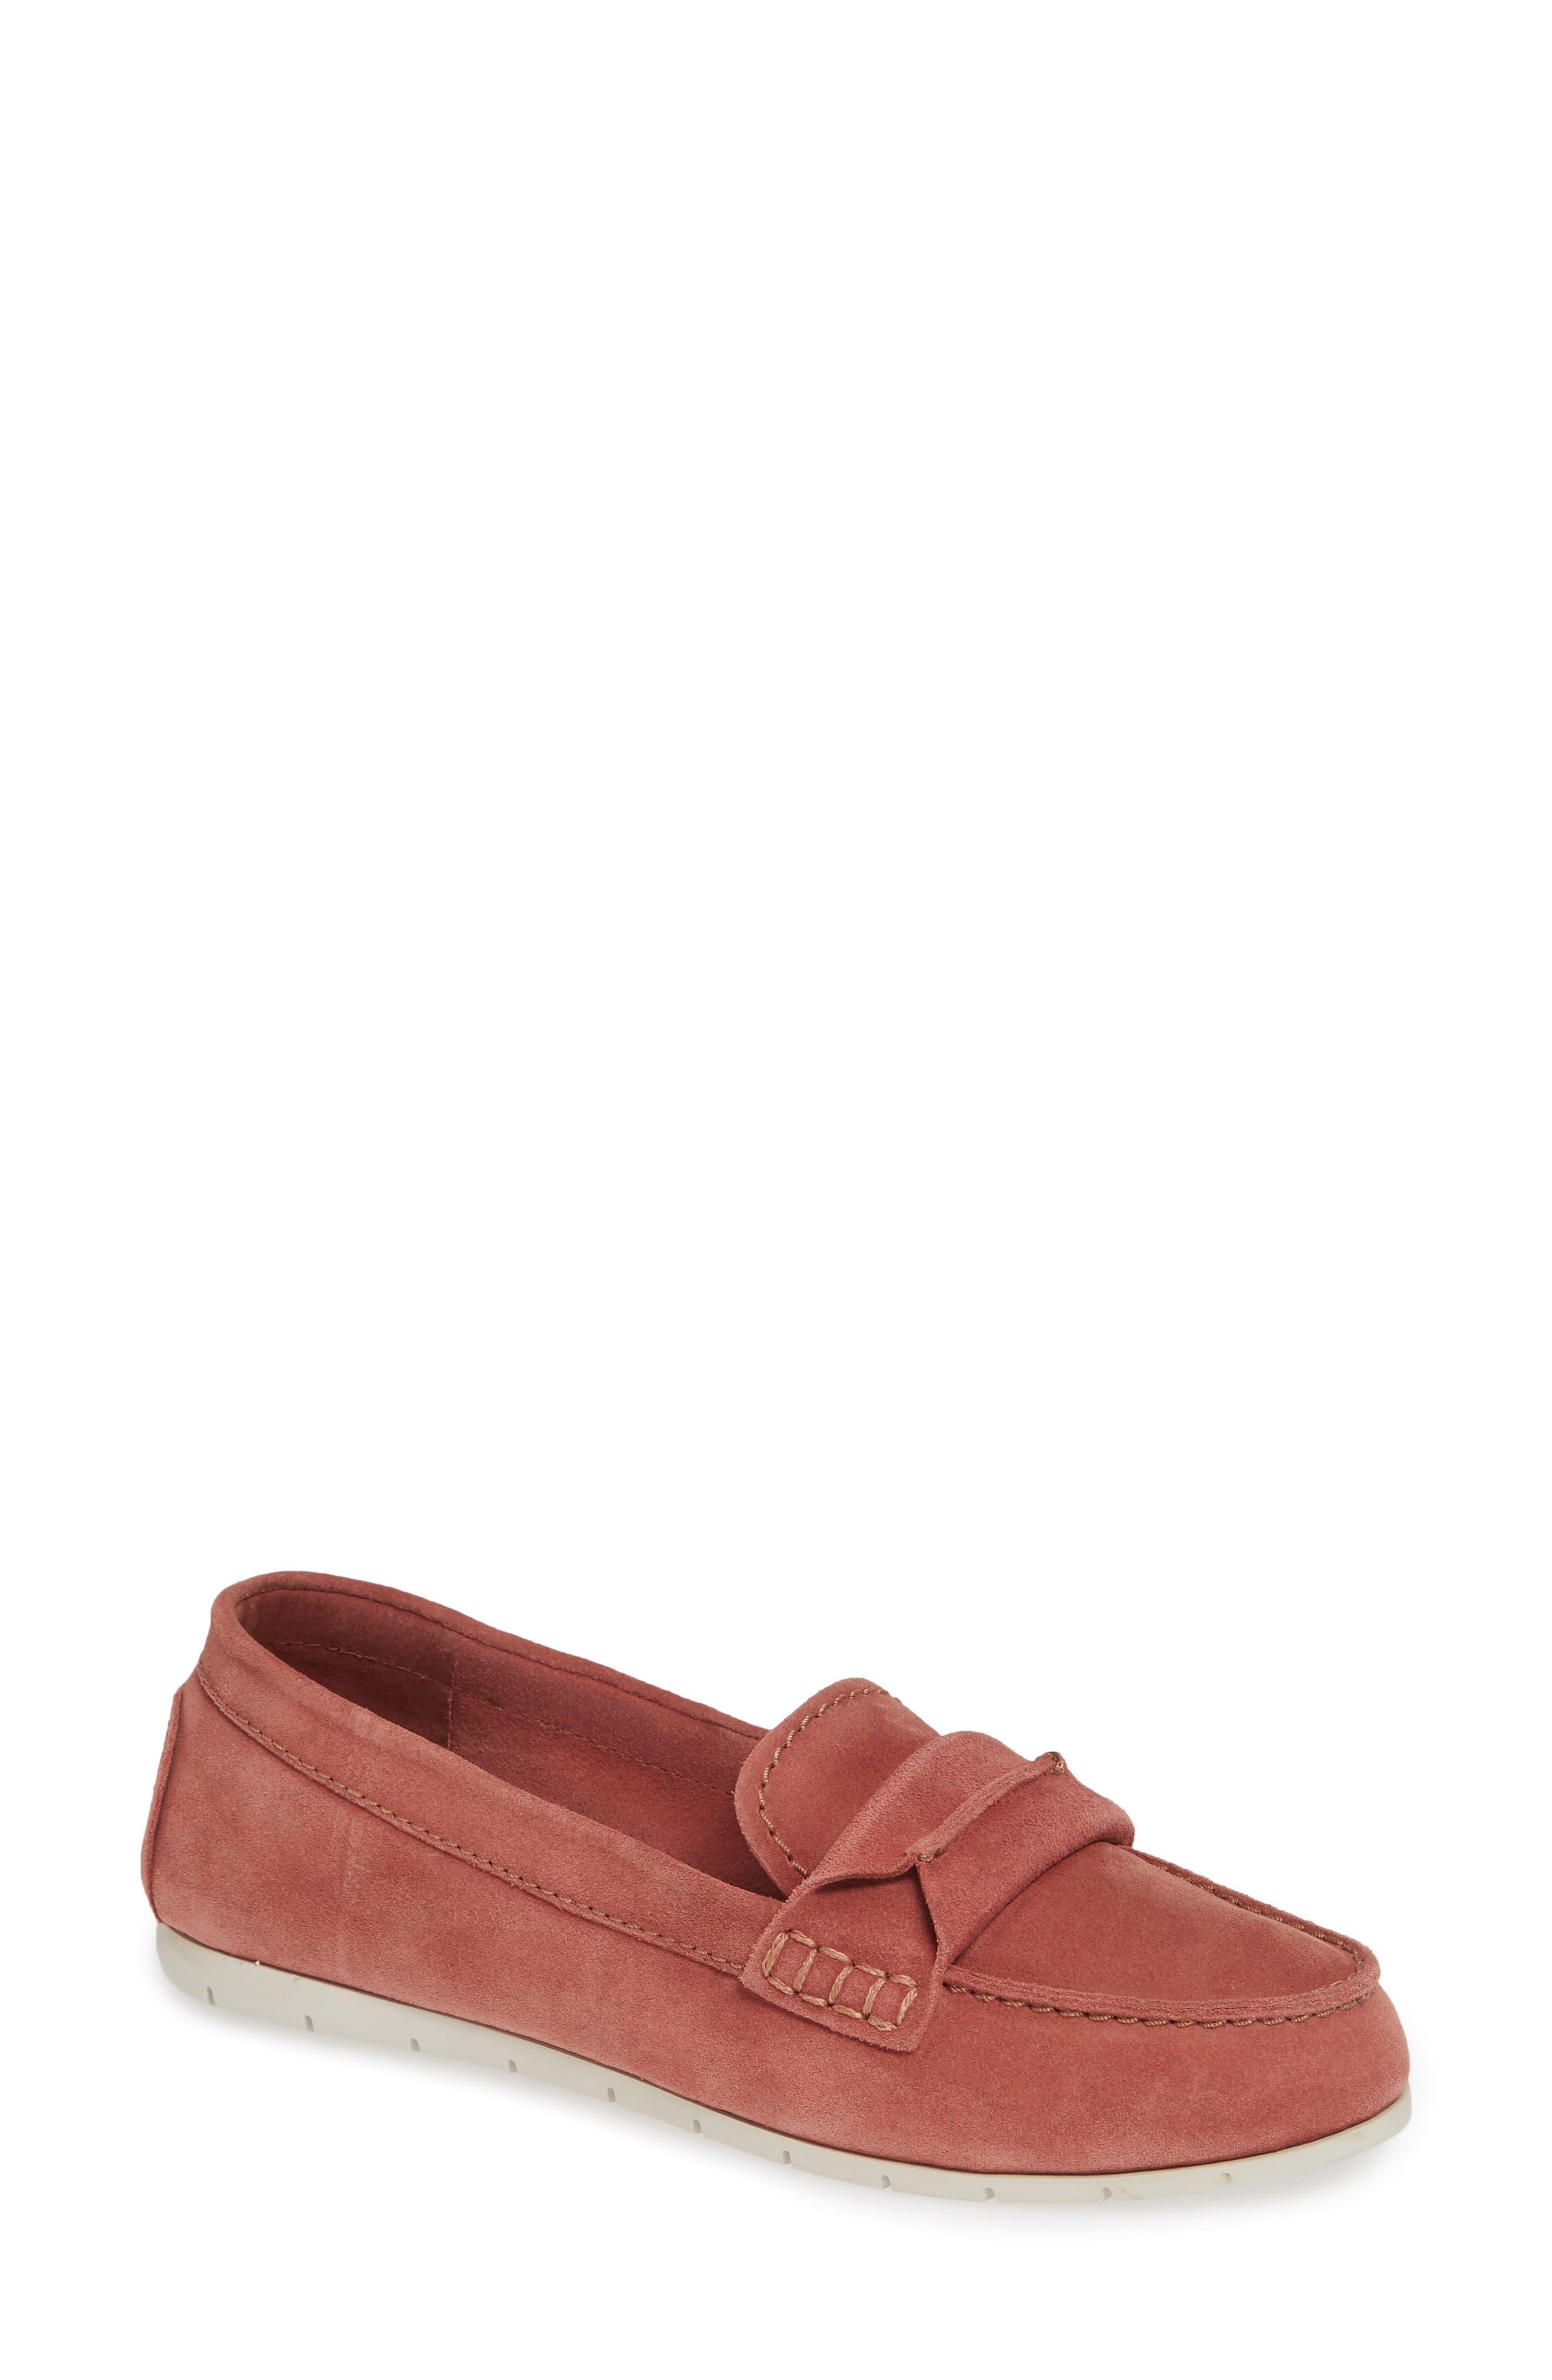 Frye Sedona Top Seam Moccasin Loafer, Pink